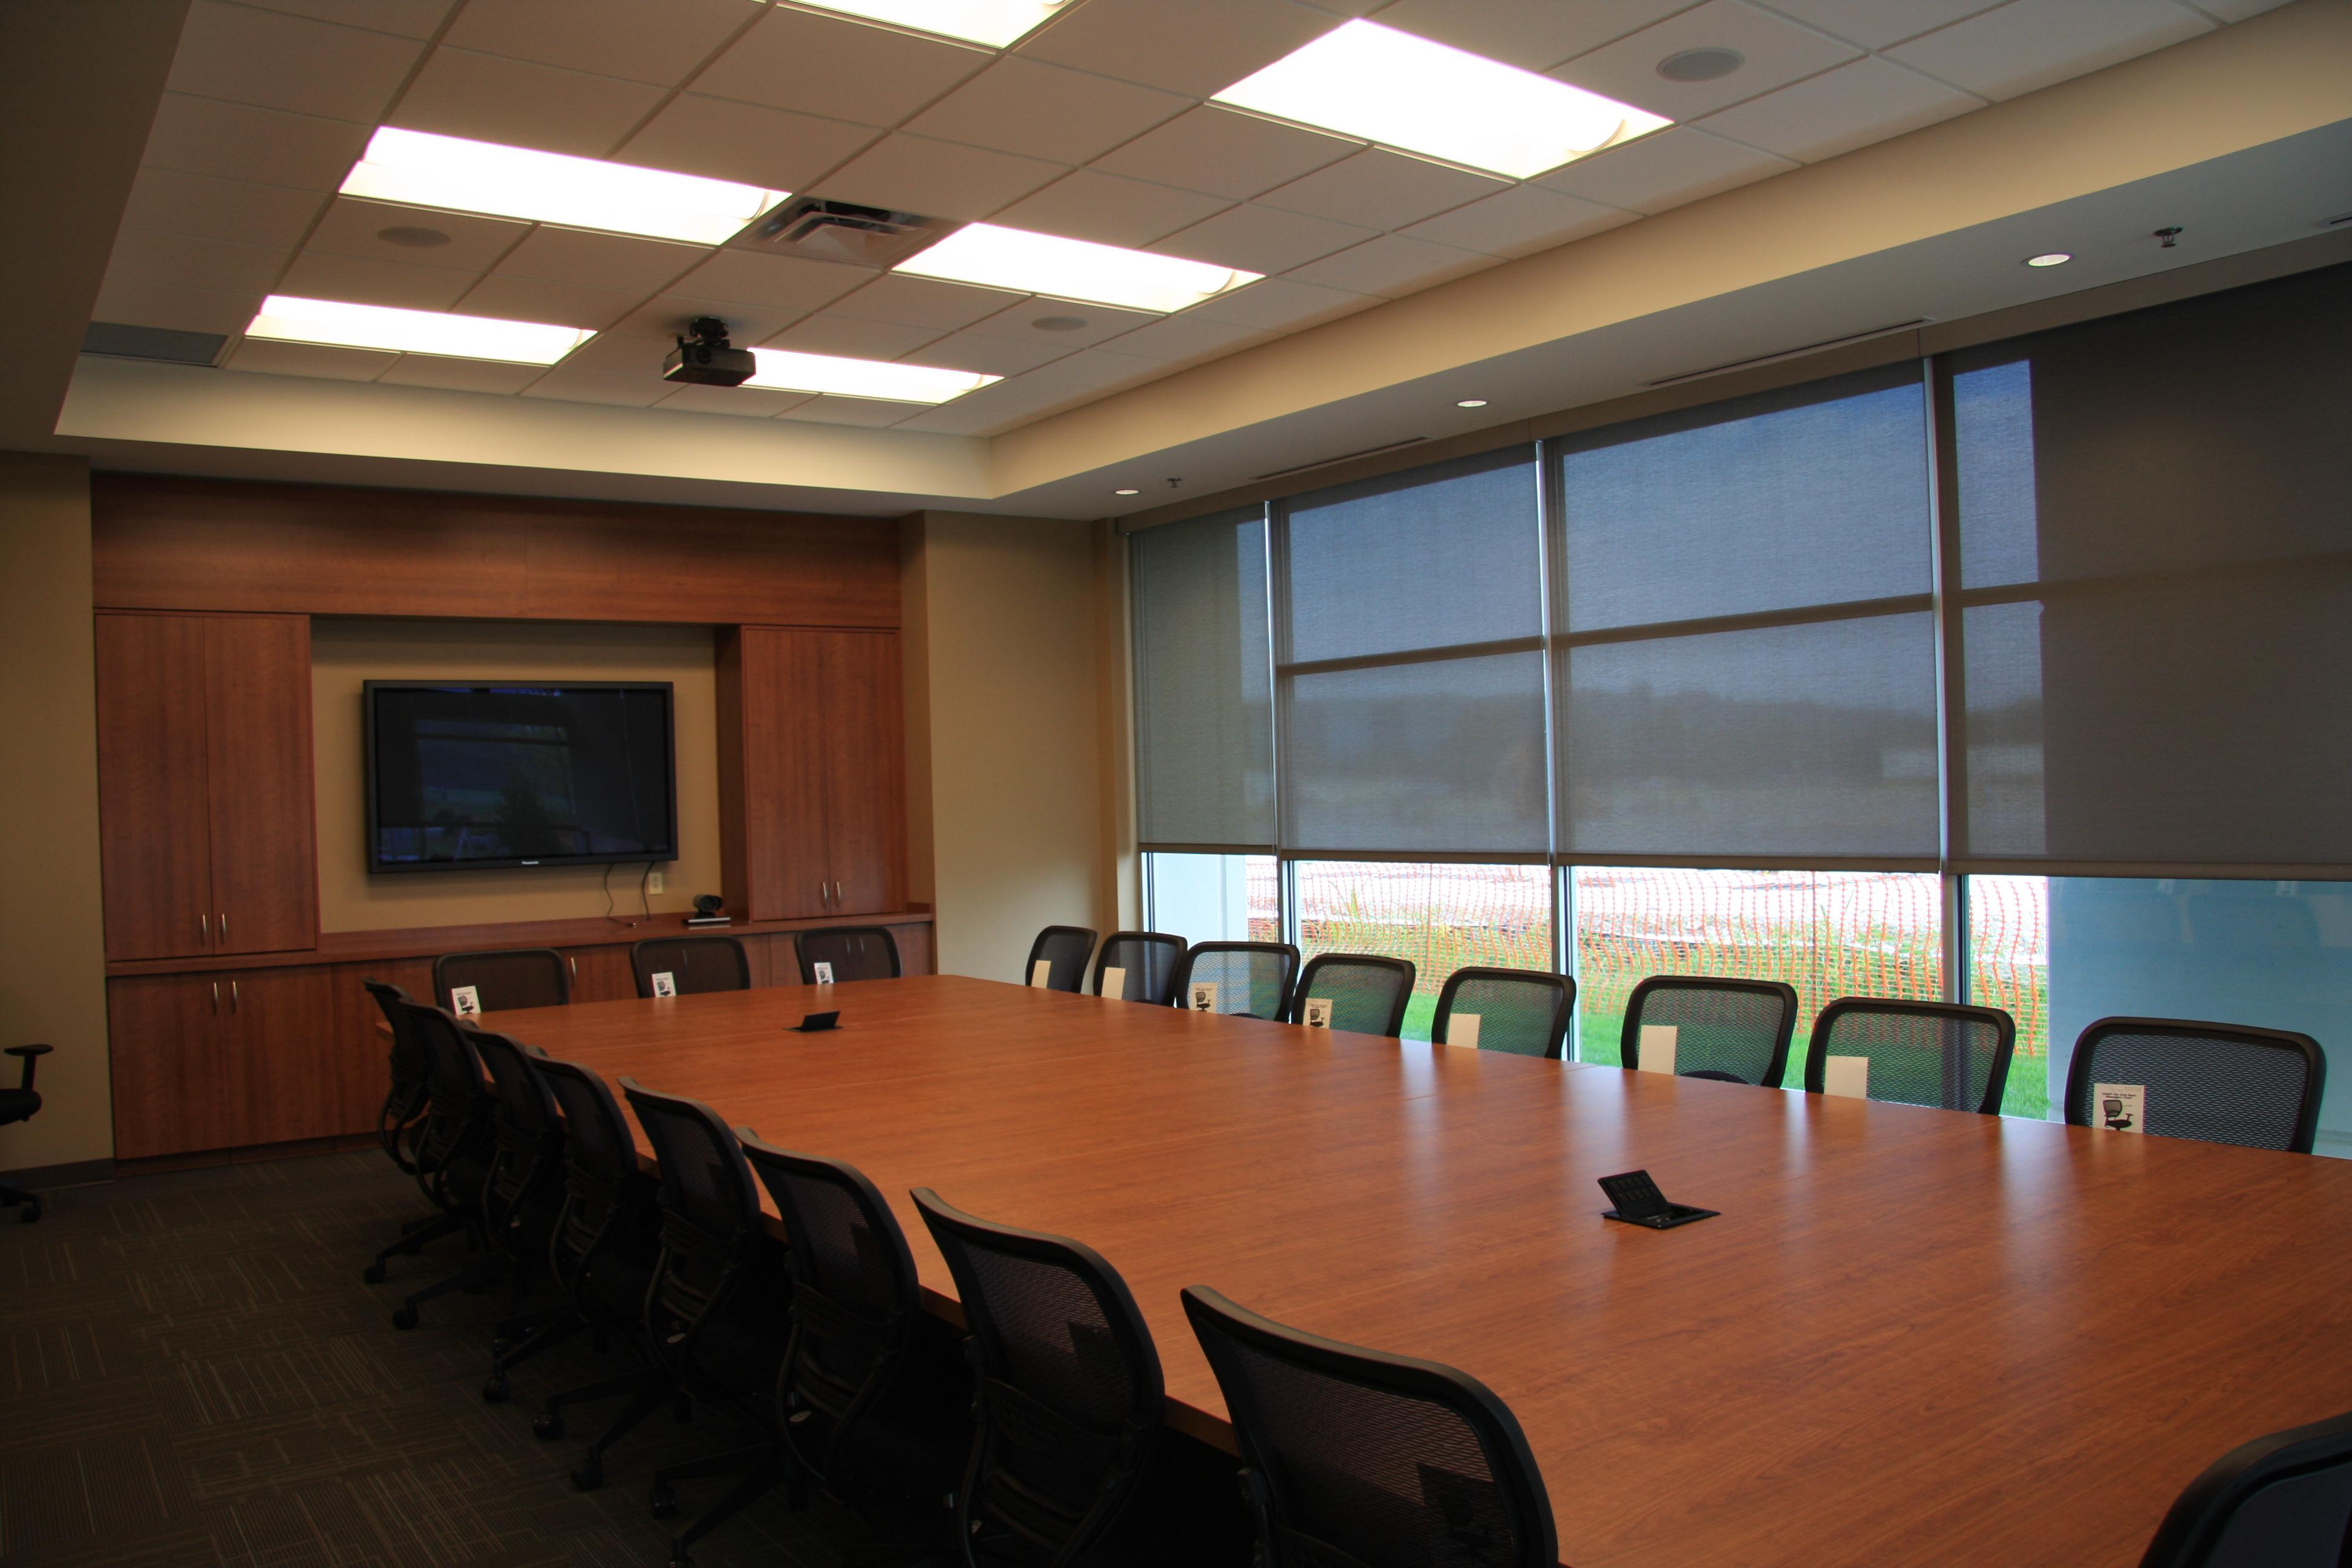 HealthSpring Corporate Office